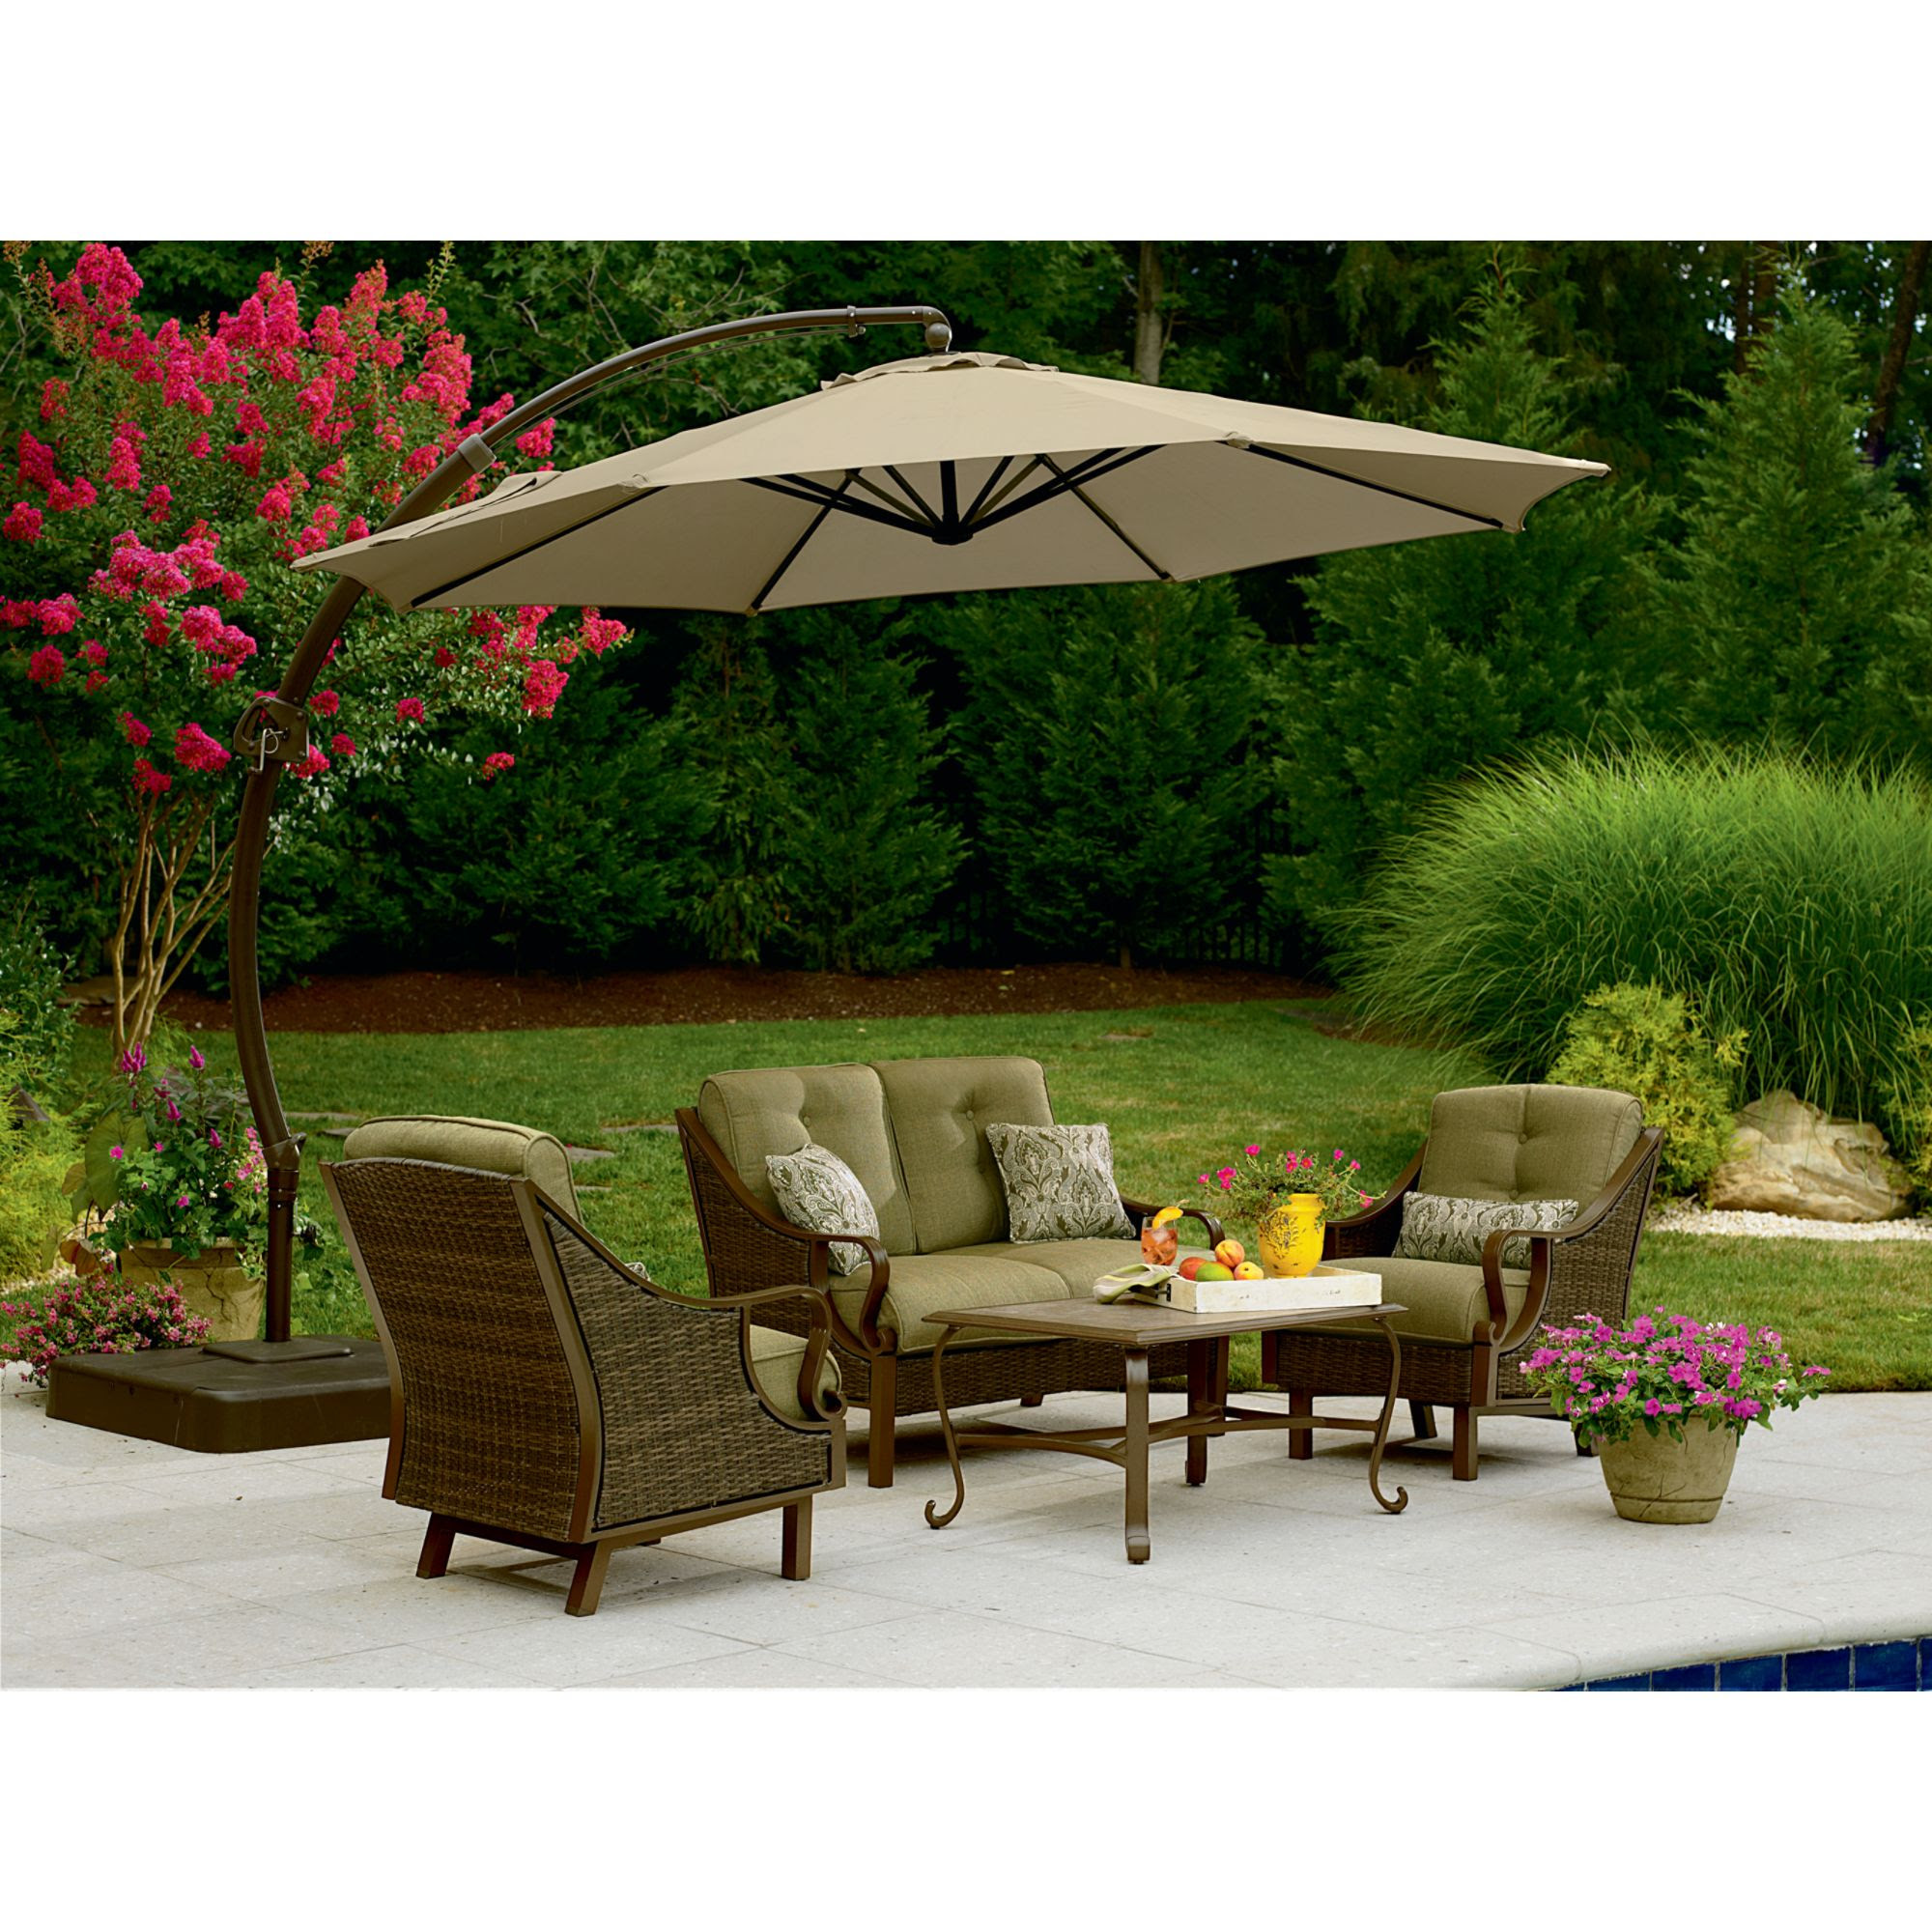 Review Garden Oasis 11.5 Ft. Steel Round Offset Umbrella ...